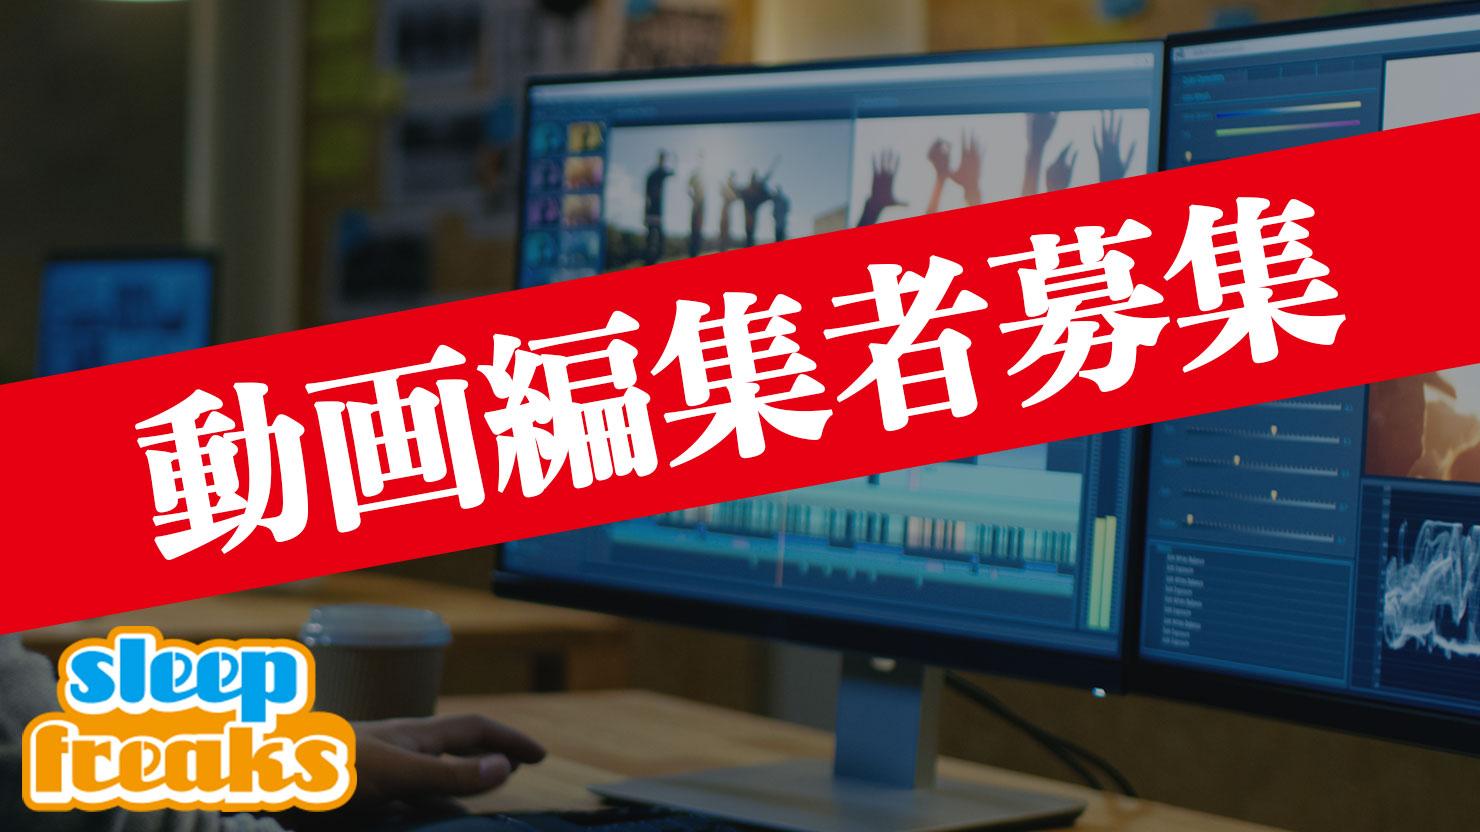 Recruitment of video editors